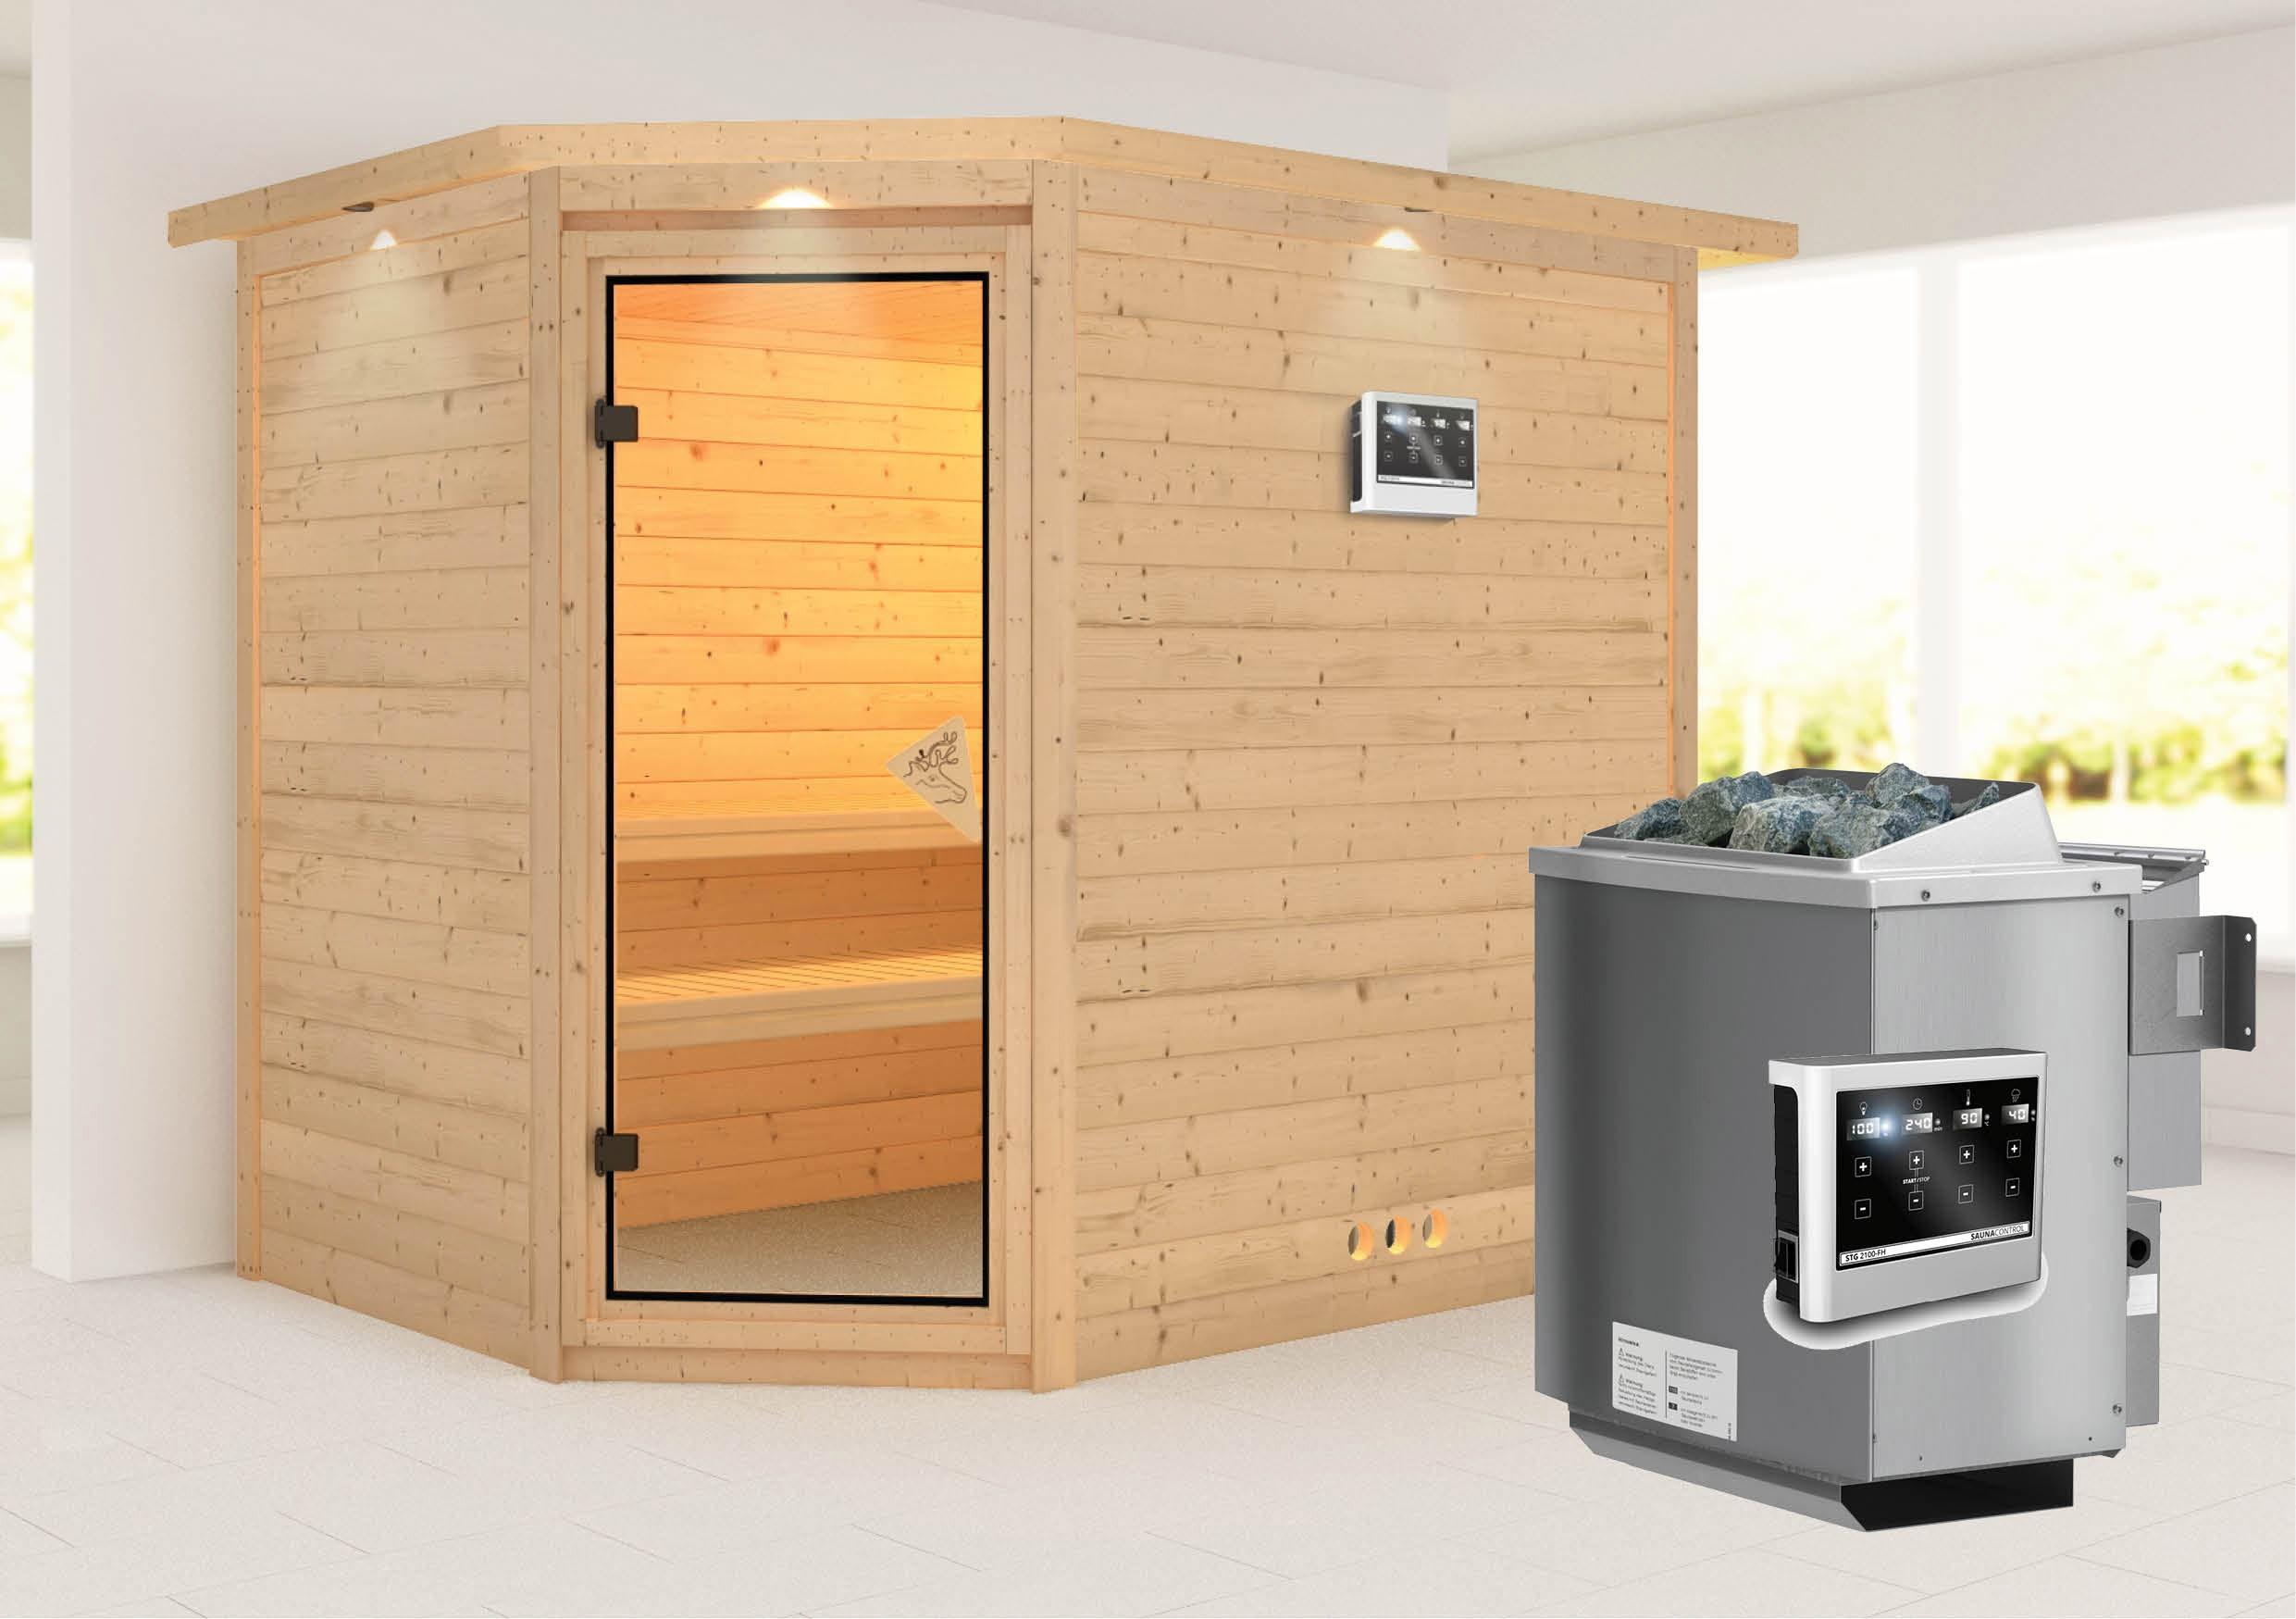 Karibu Sauna Tanami 40mm Dachkranz + Bio Ofen 9kW extern classic Tür Bild 1